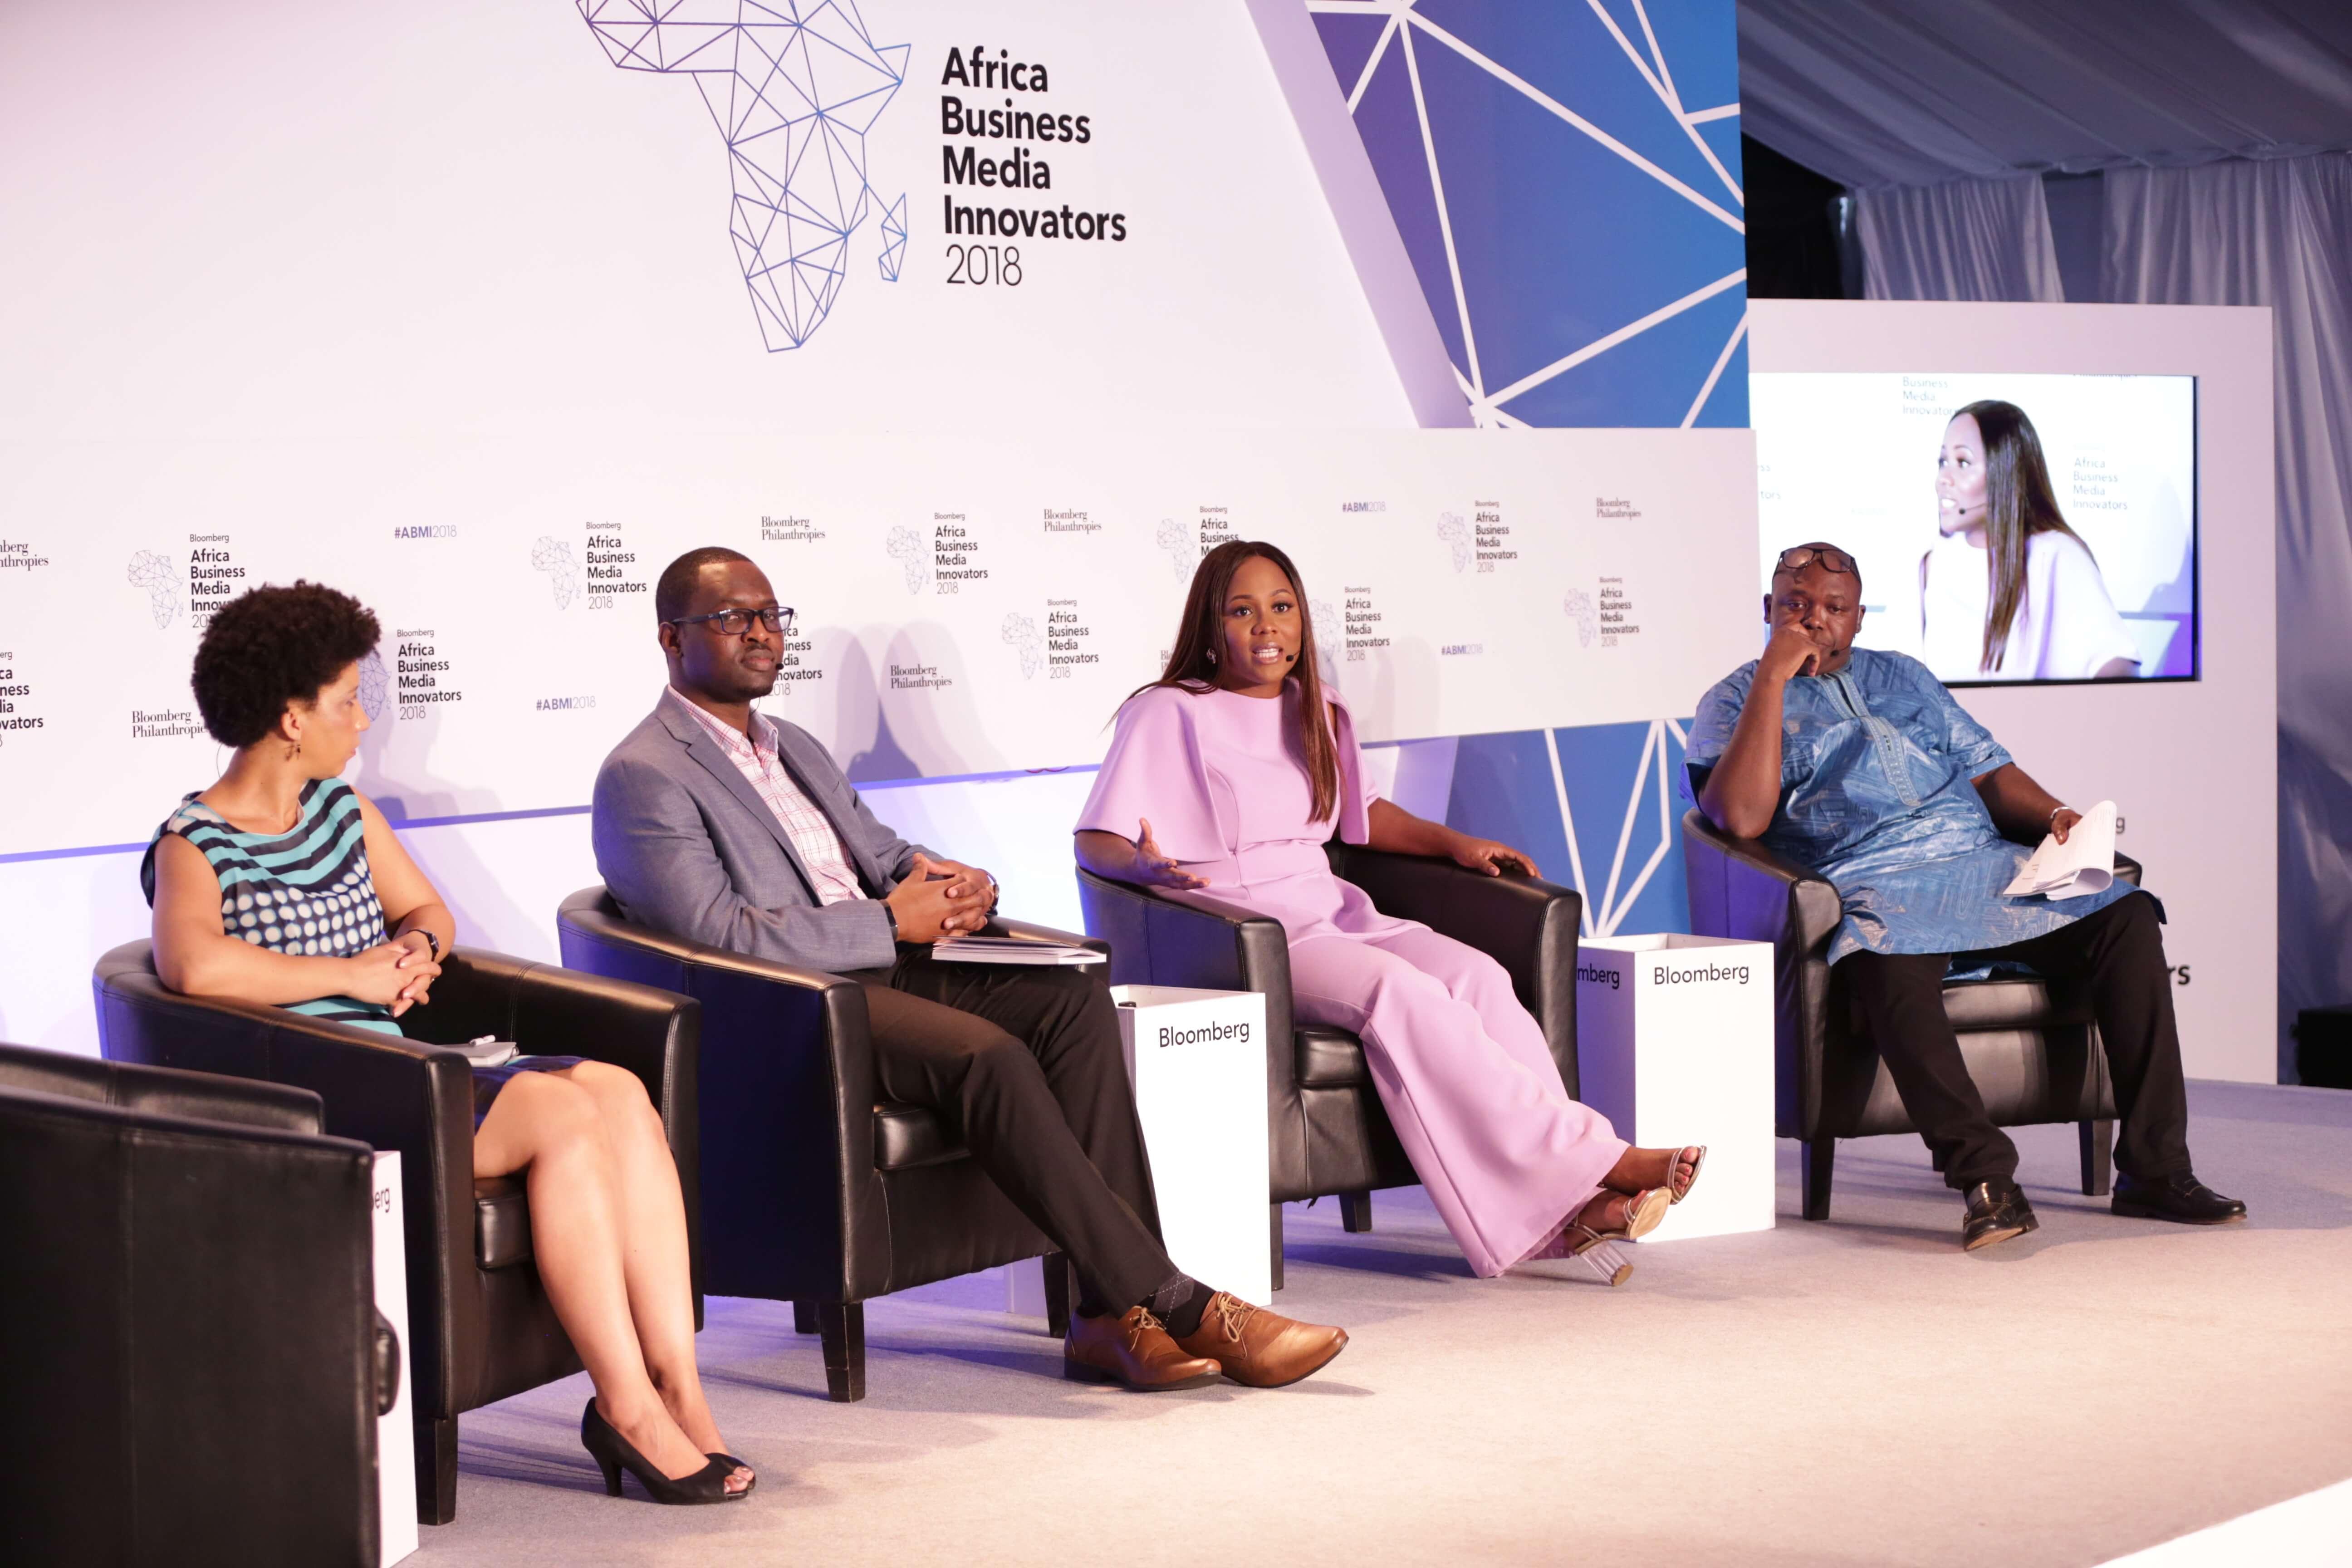 Africa Business Media Innovators 2018 | Convening Leaders | Bloomberg LP